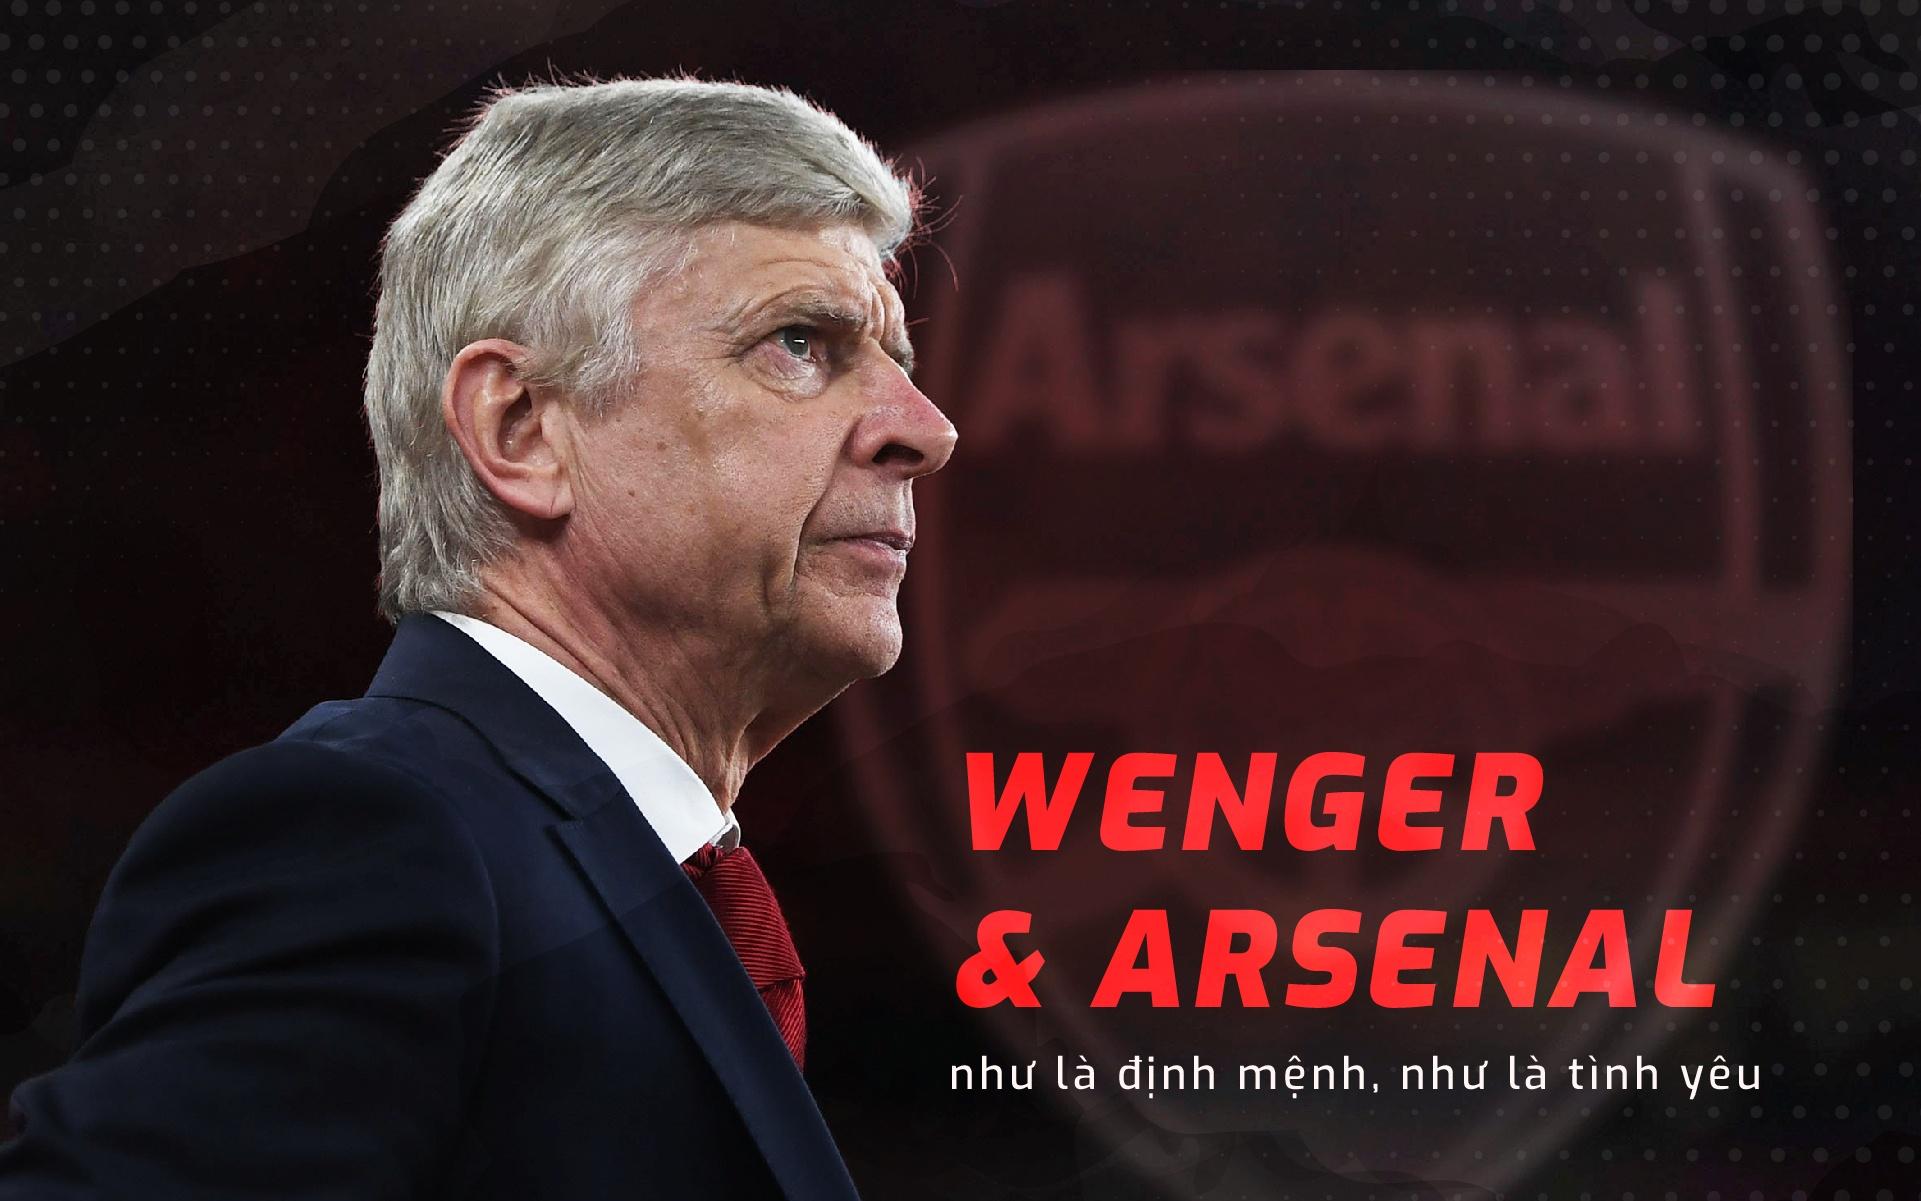 Wenger va Arsenal: Den vi dinh menh, gan bo vi tinh yeu hinh anh 2